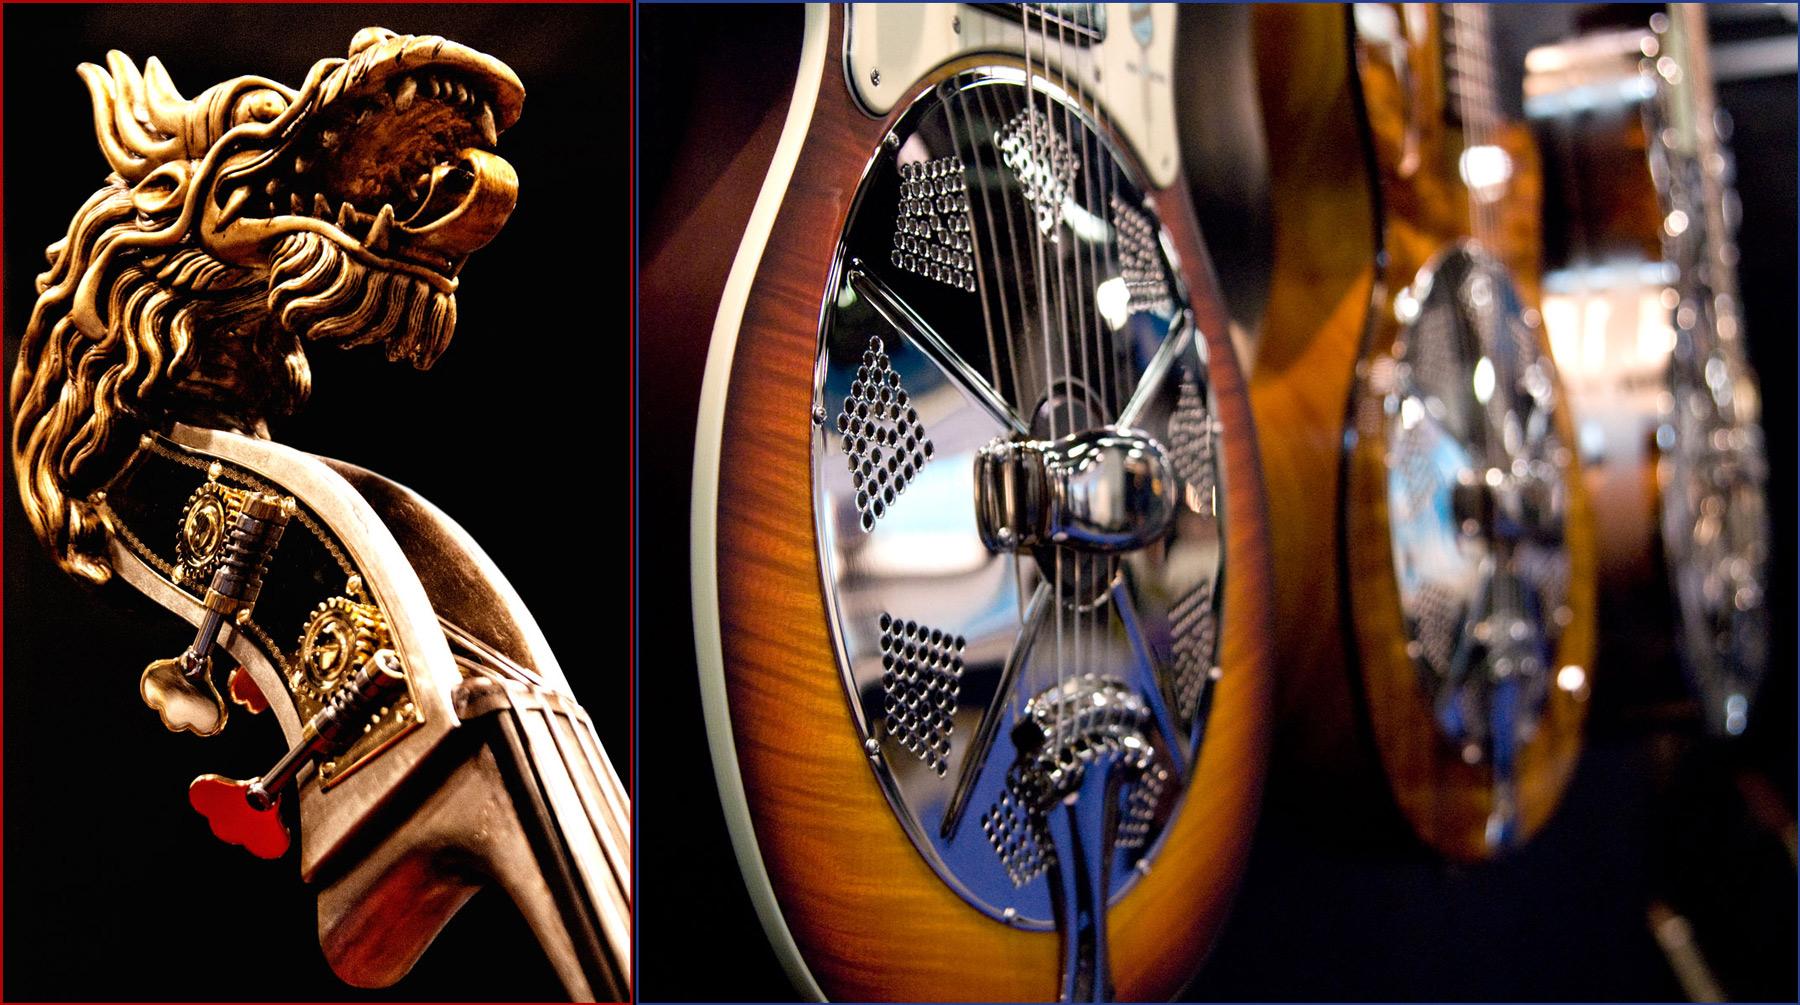 Basshead-Musicman Photography